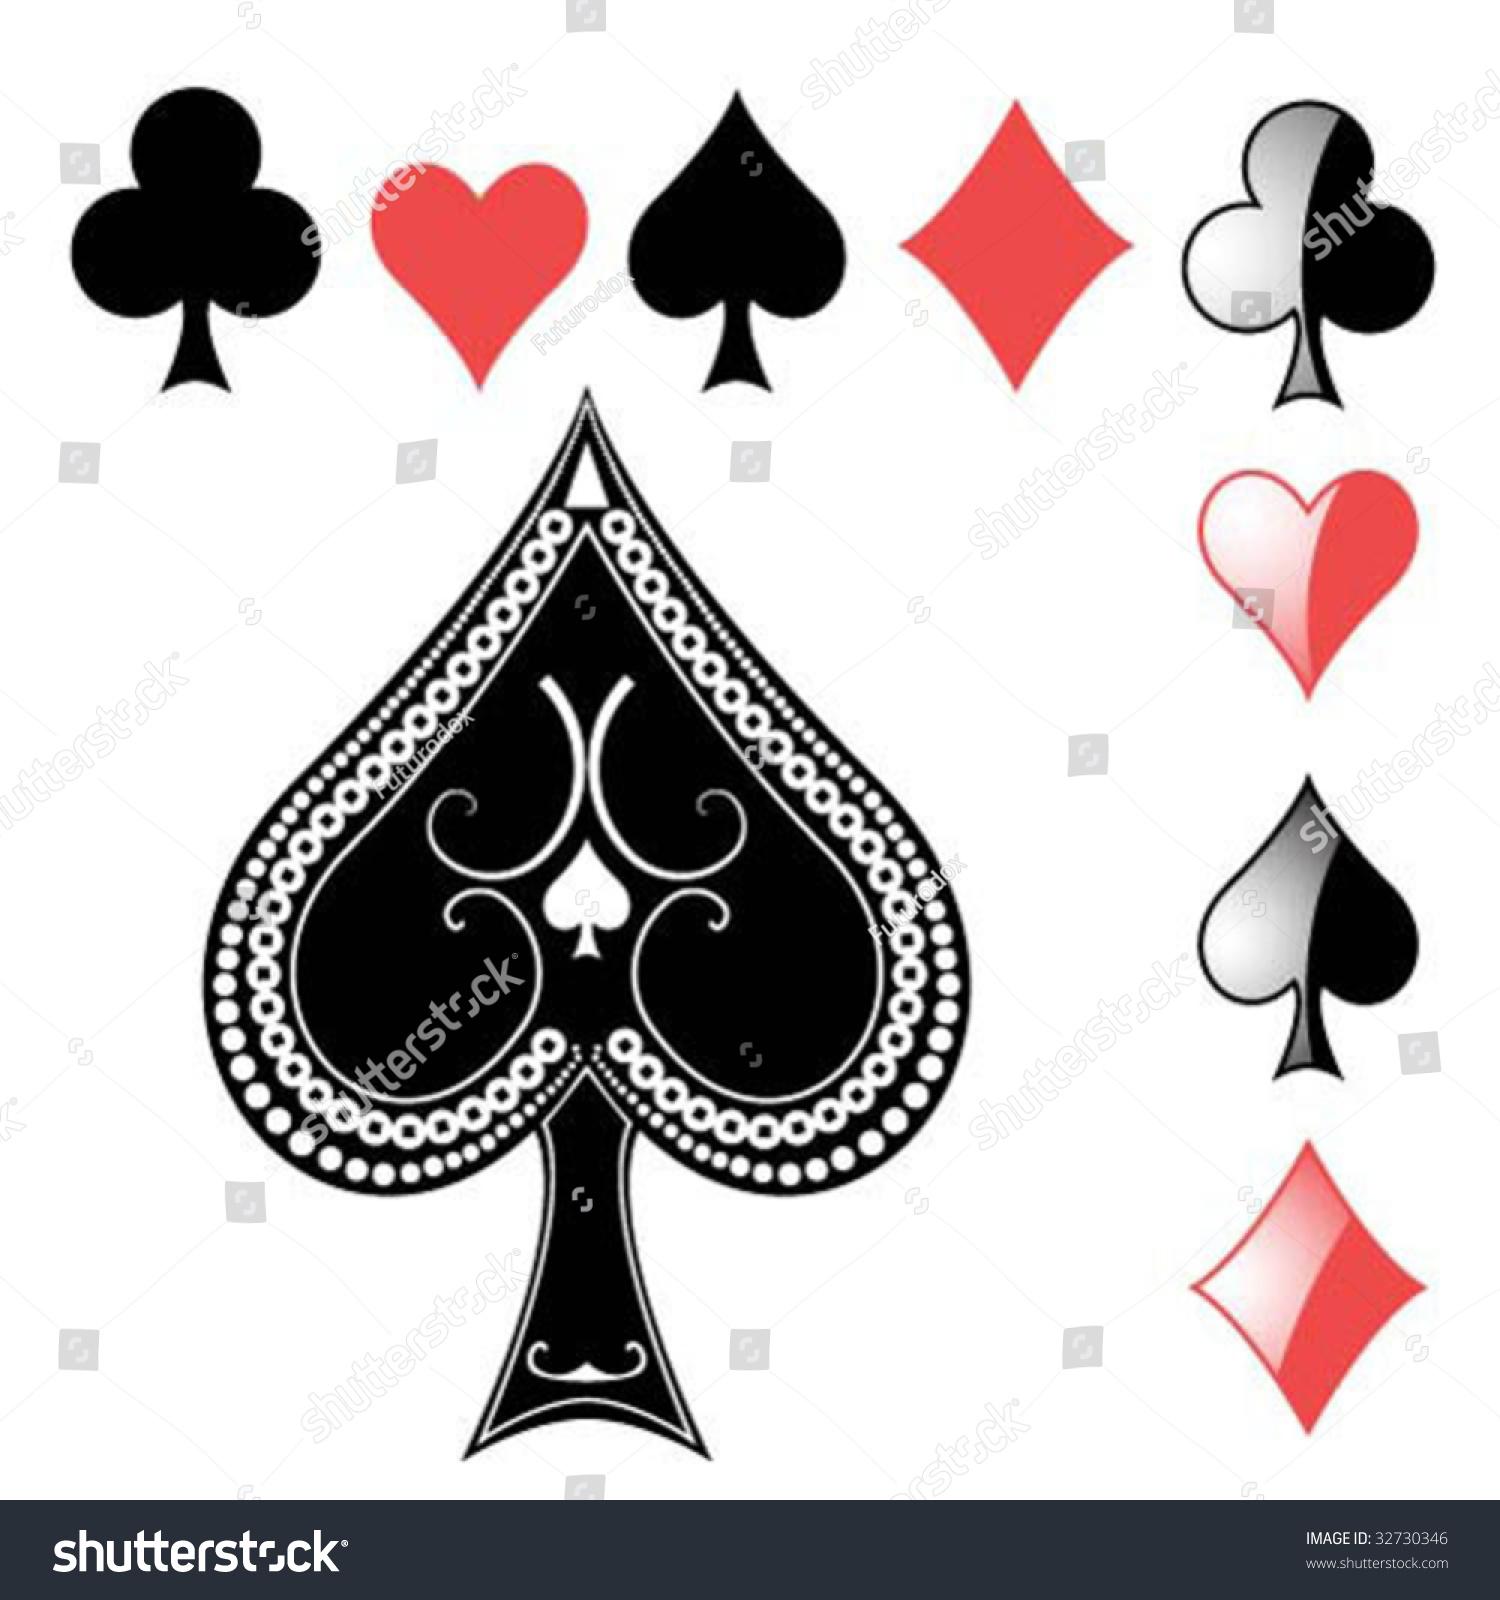 Vector card symbols ace spades stock vector 32730346 shutterstock vector card symbols with ace of spades biocorpaavc Choice Image